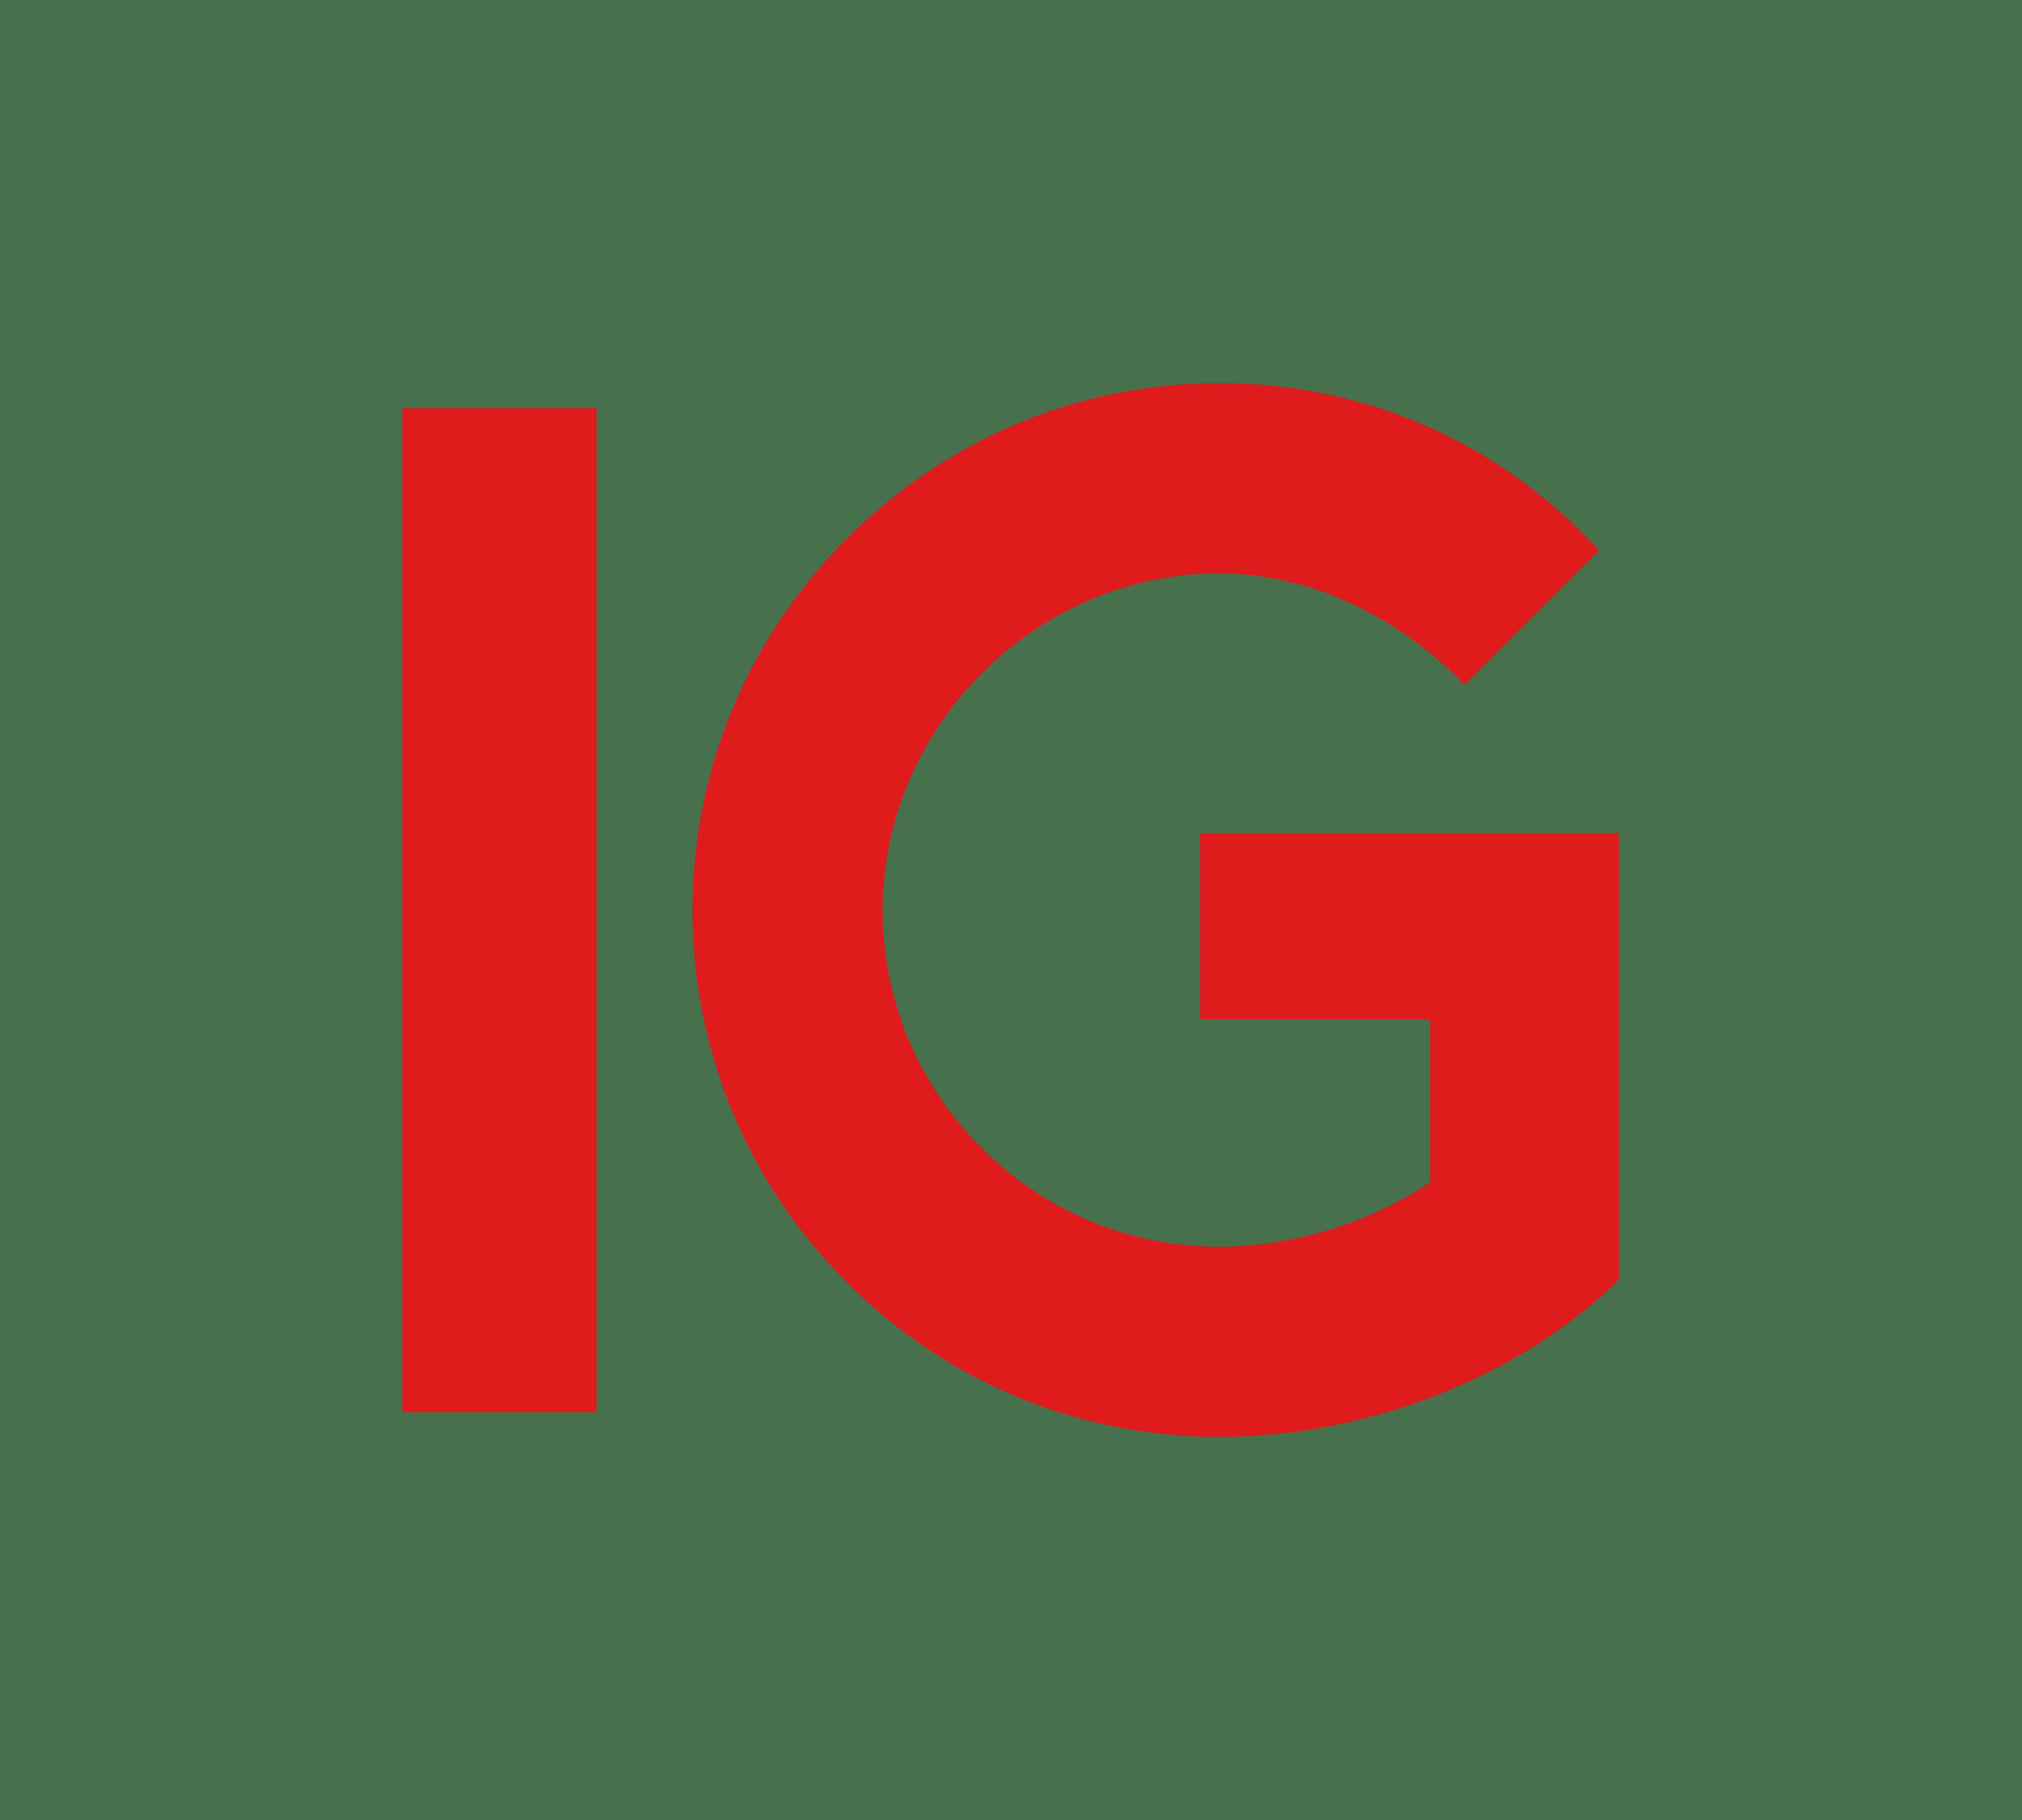 Ig Logo Rgb Red